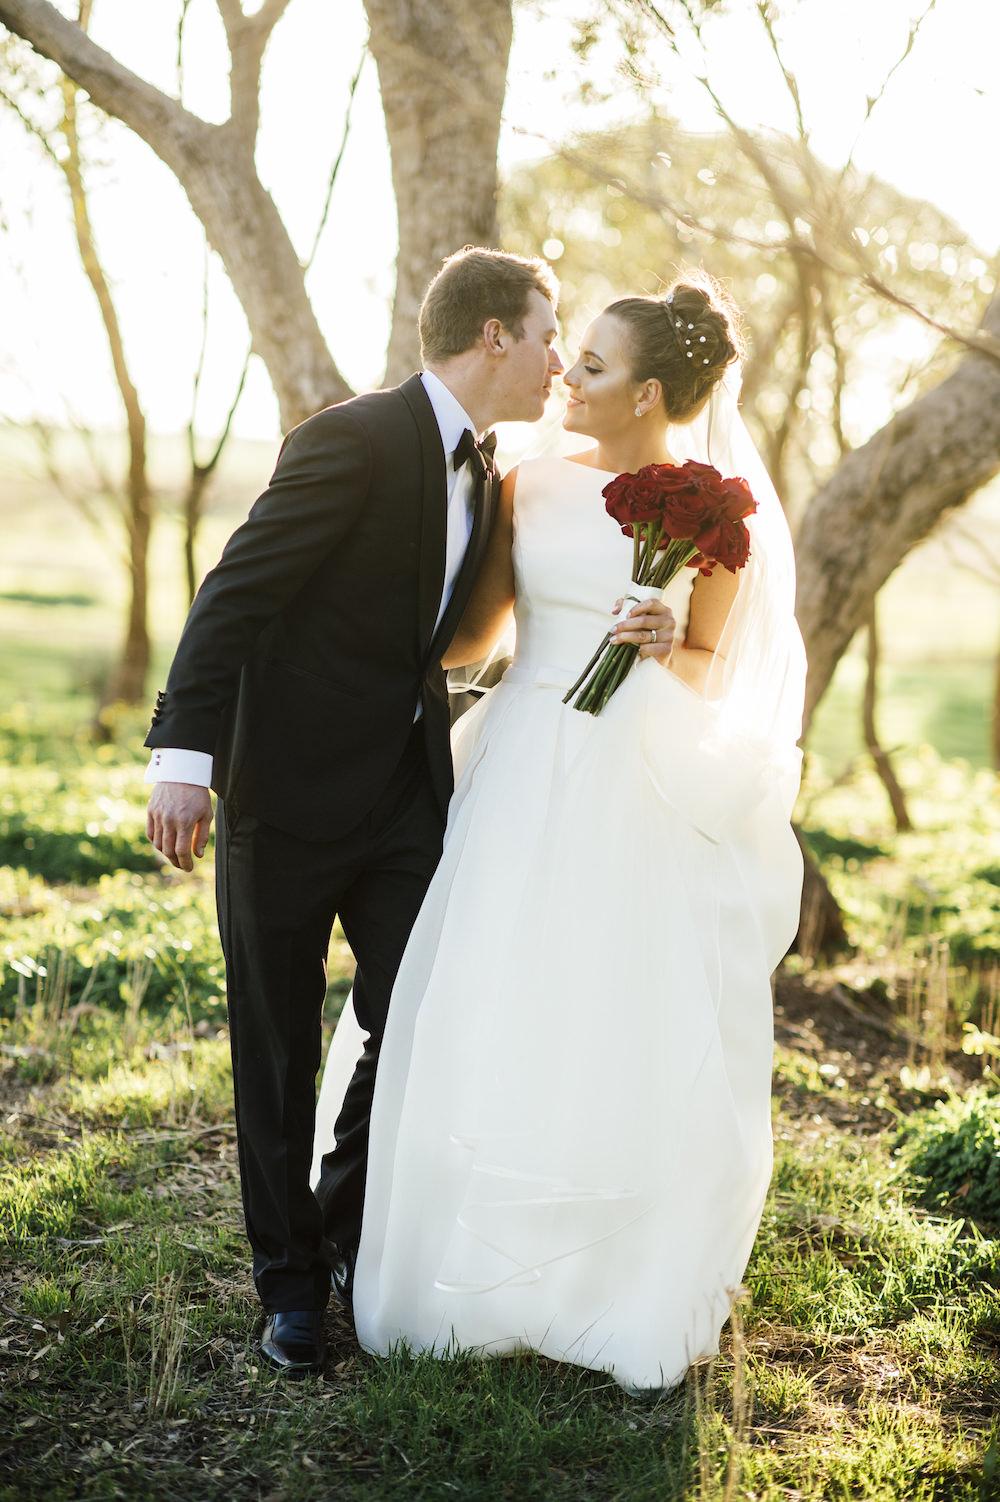 lindahamish-wedding-434.JPG